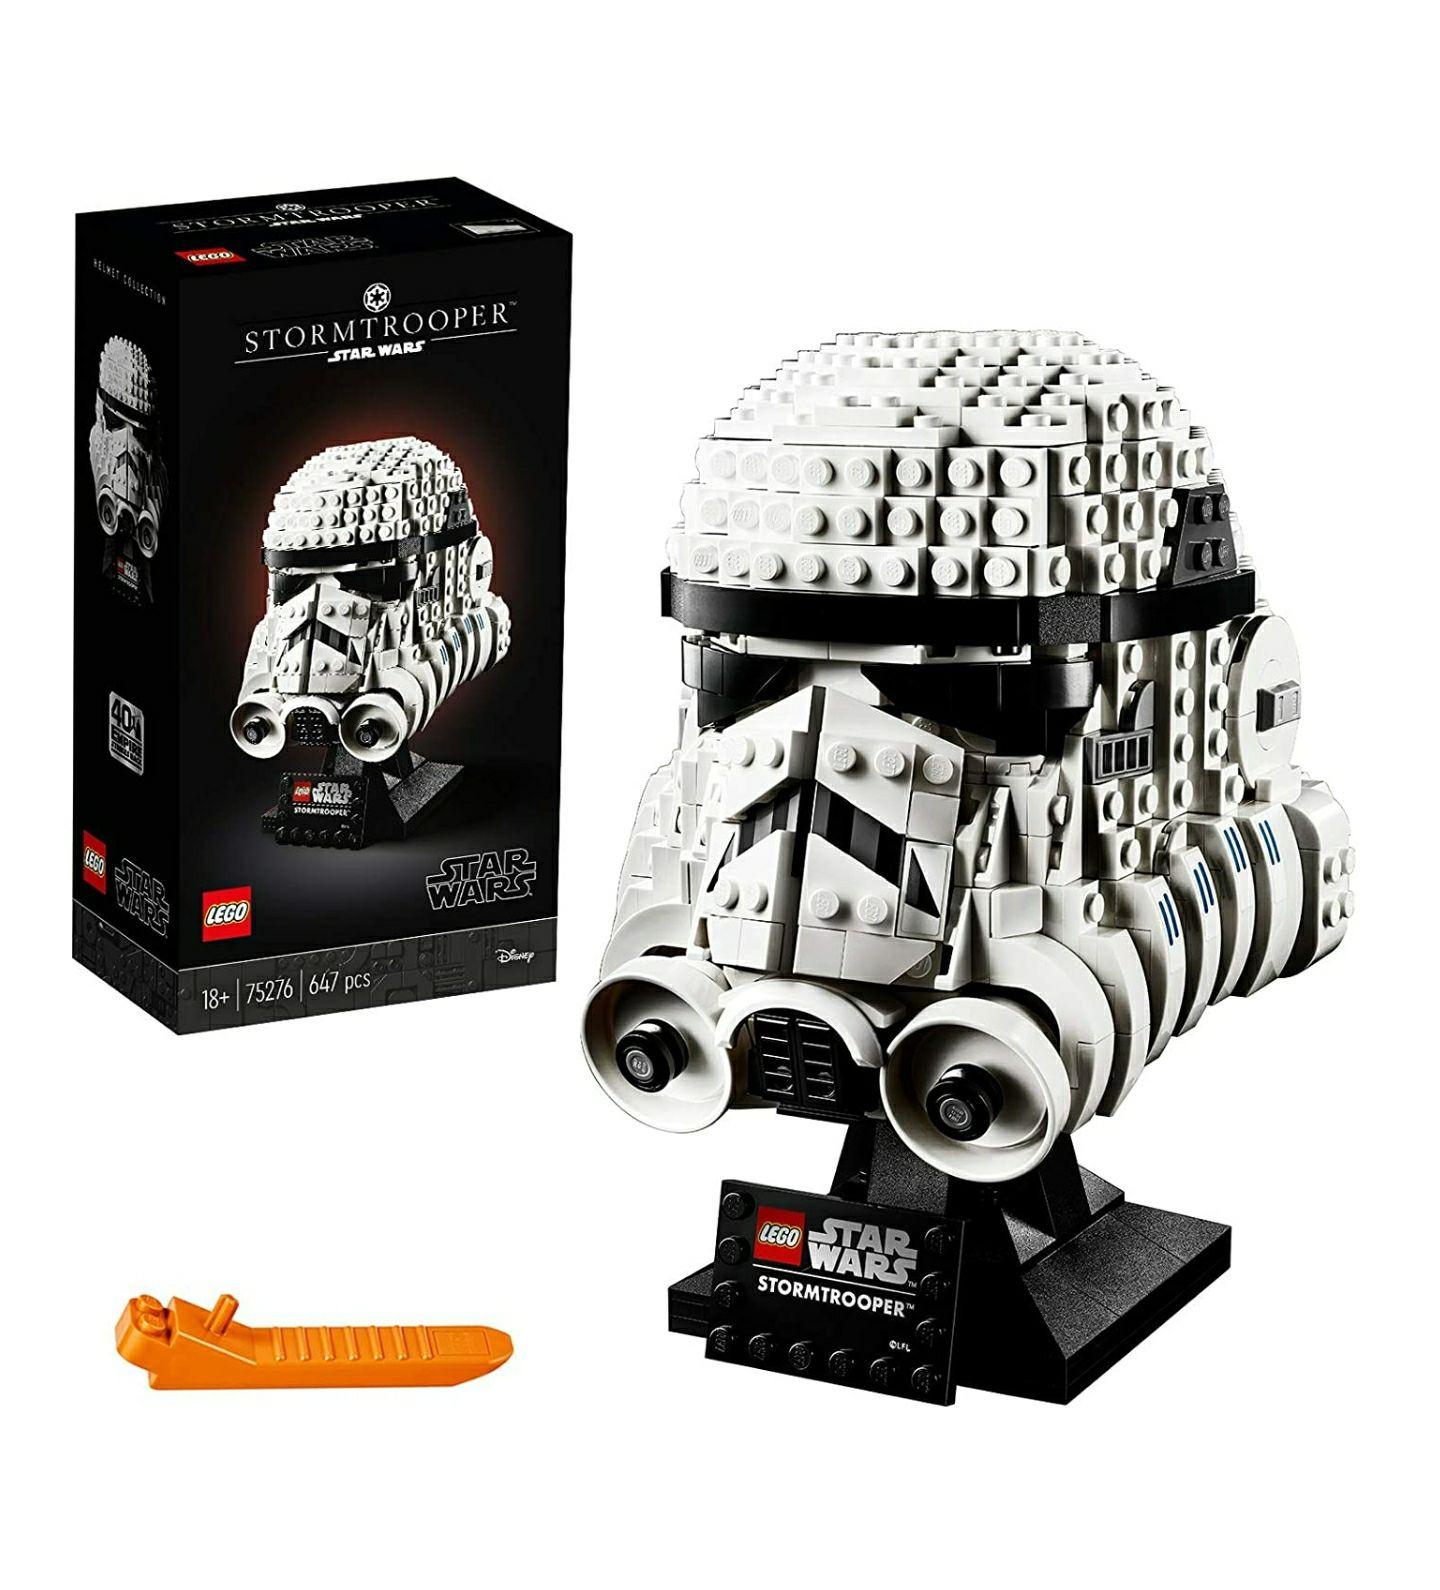 [Amazon] LEGO Star Wars Stormtrooper Helm 39,05€ & 75277 Boba Fett Helm 40,04€